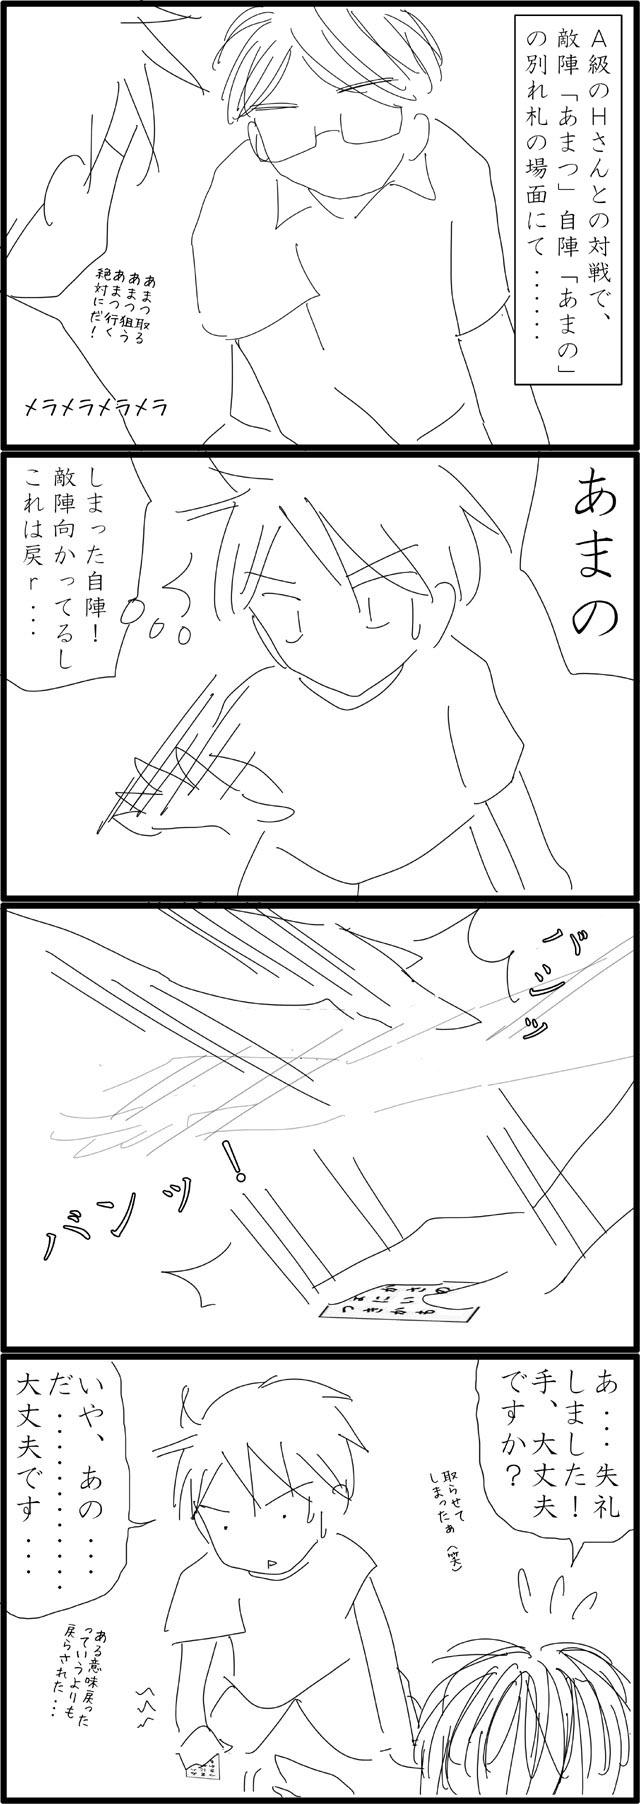 f:id:karutaru:20120923232009j:image:w480